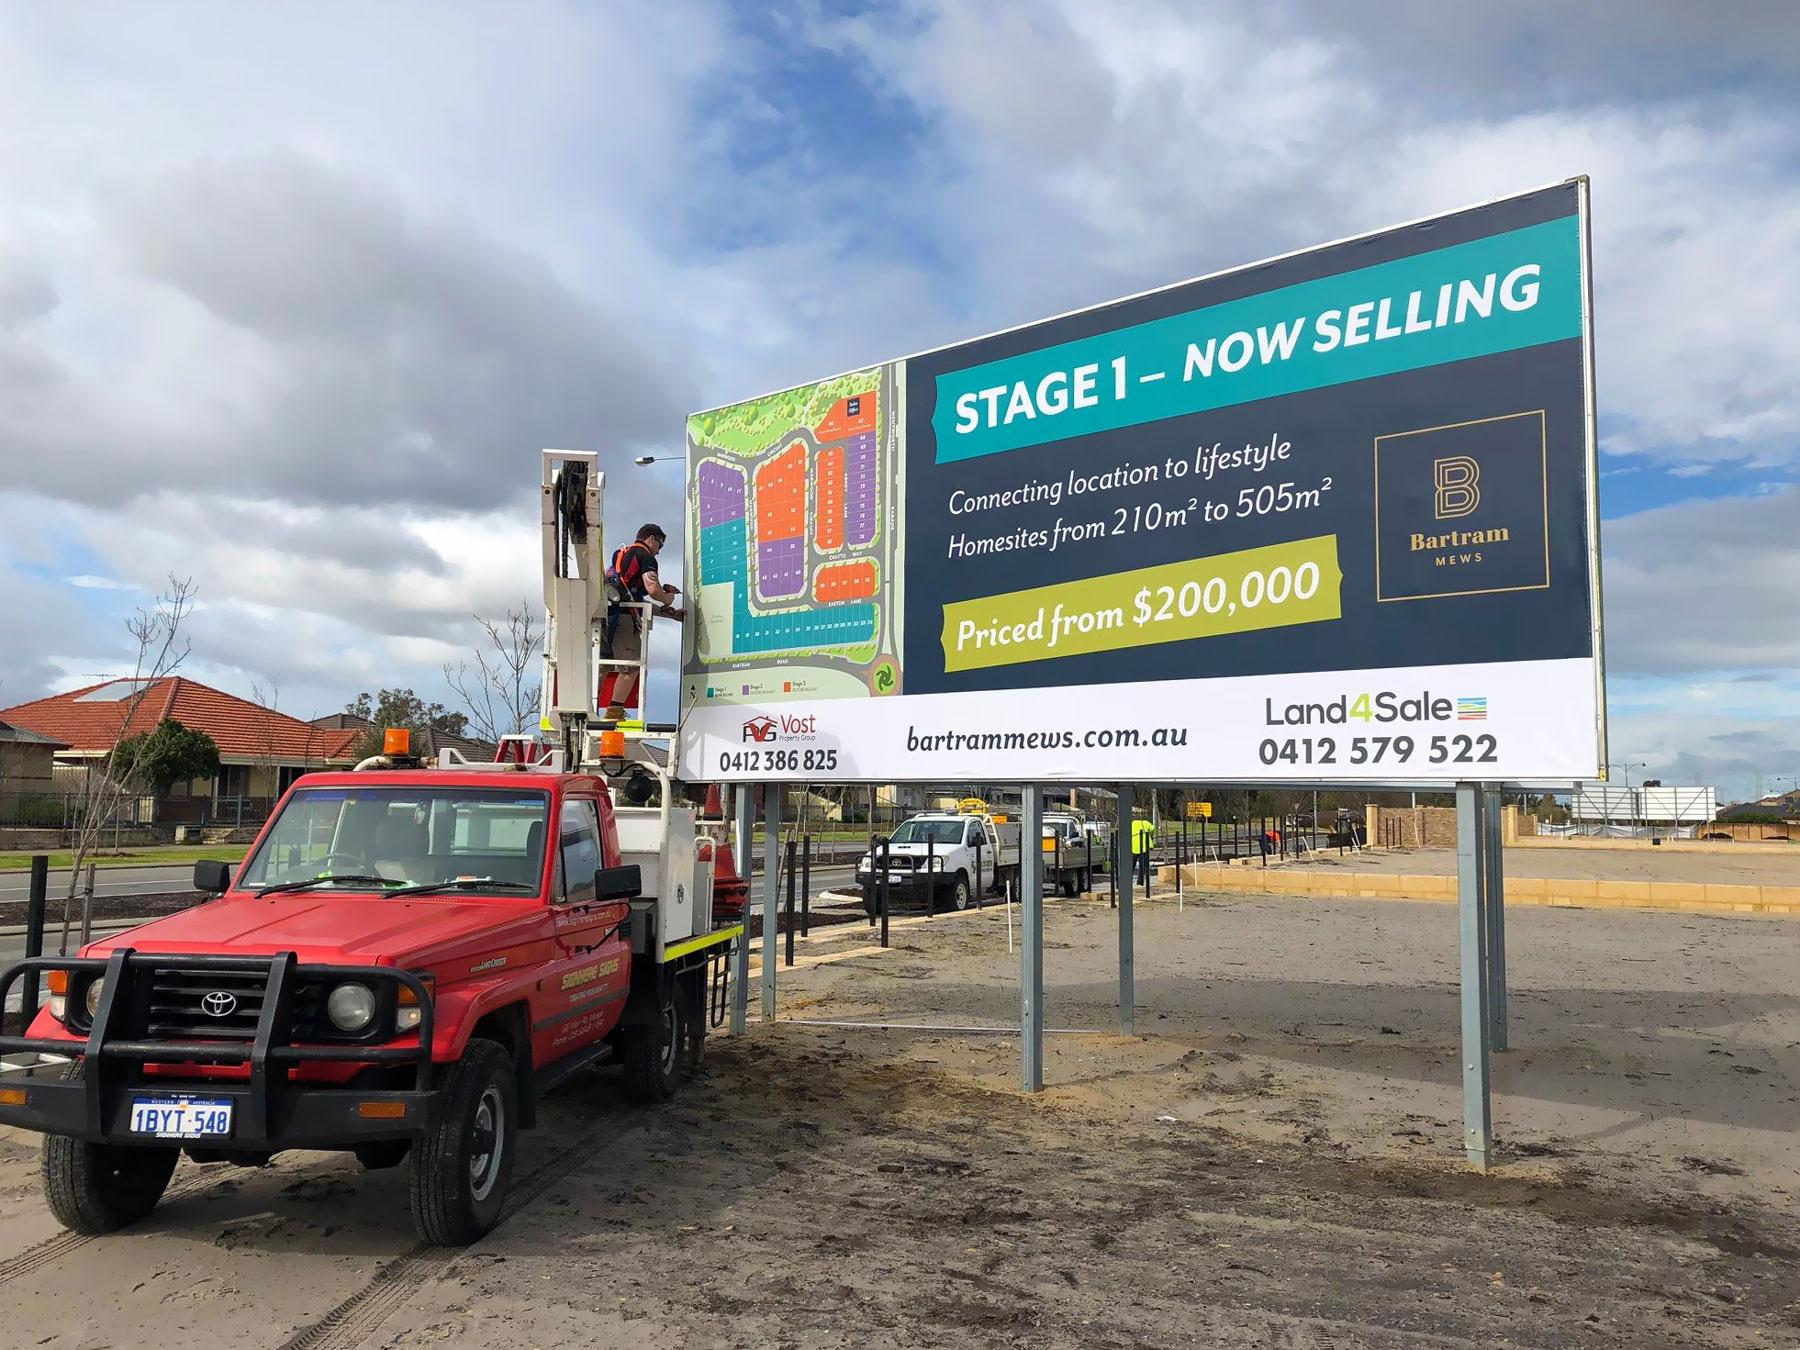 Billboard installation for Bartram Mews, Success